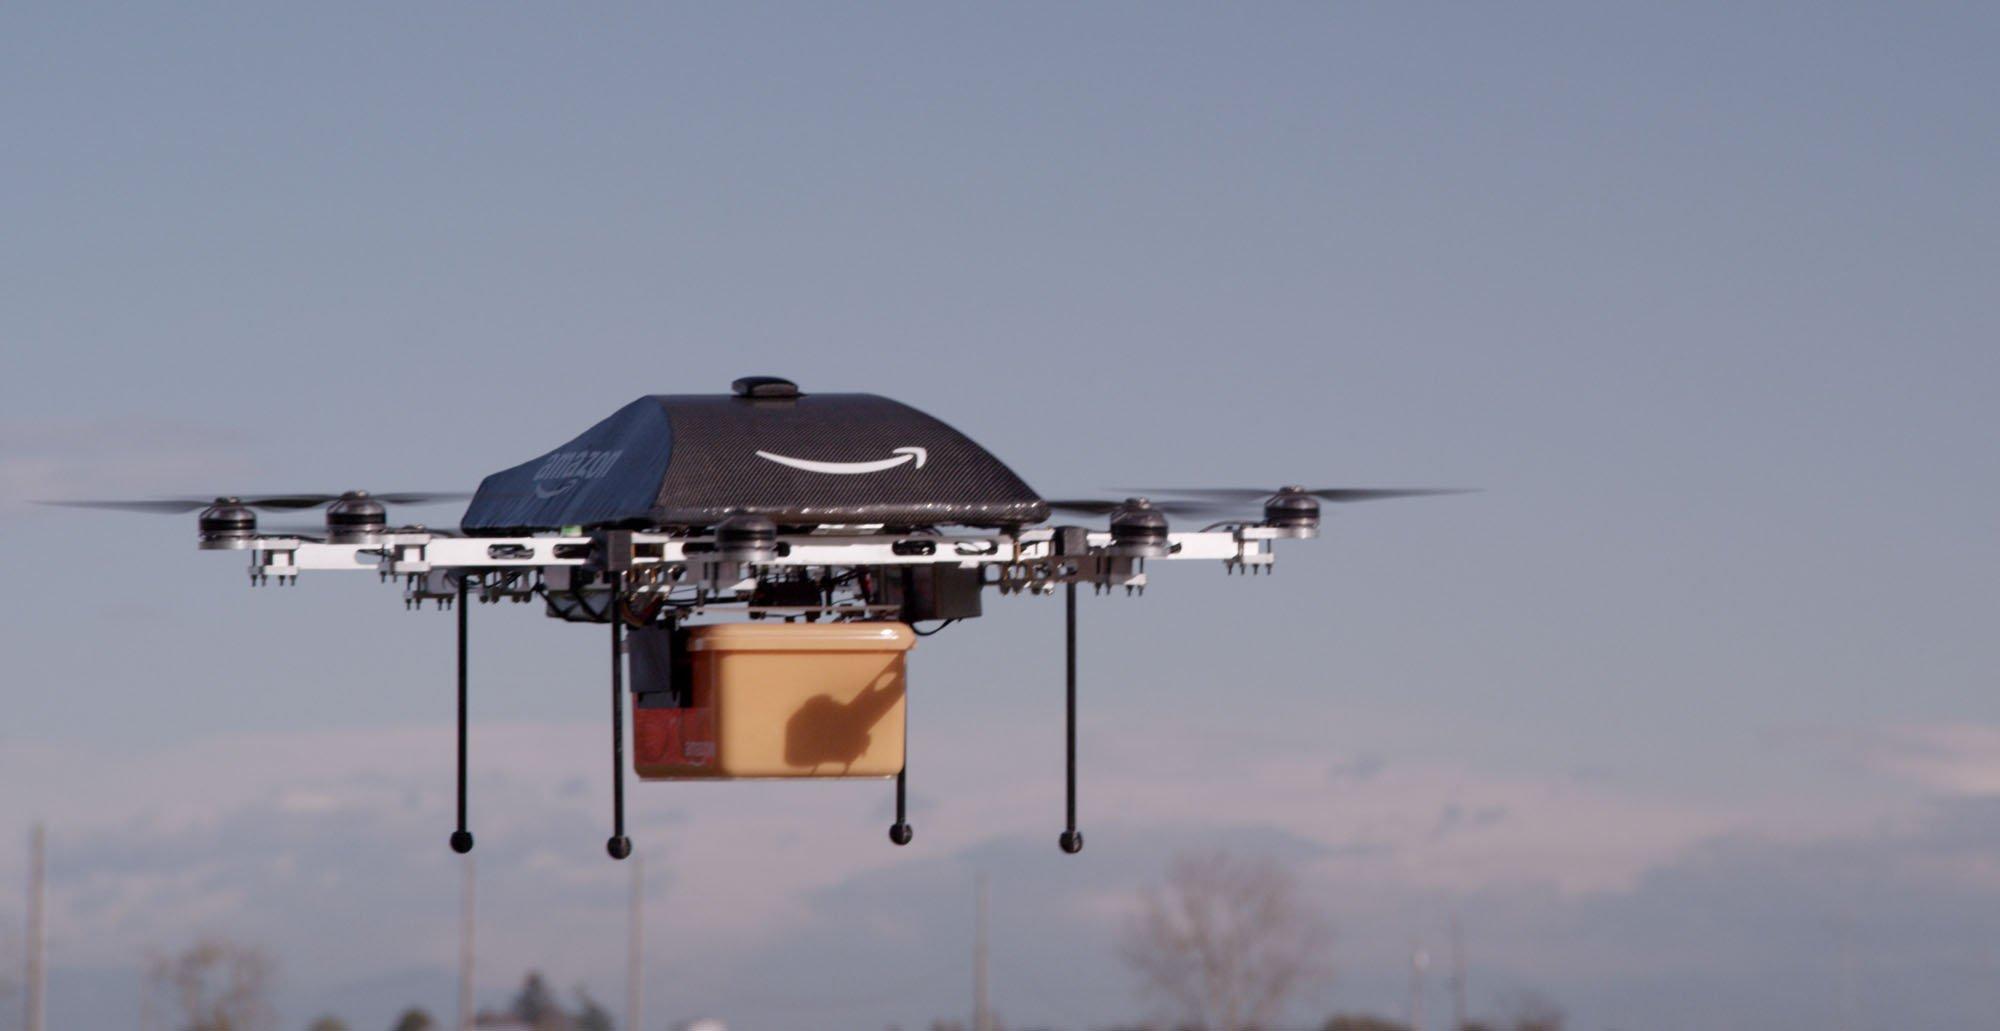 Amazone Prime Air Delivery